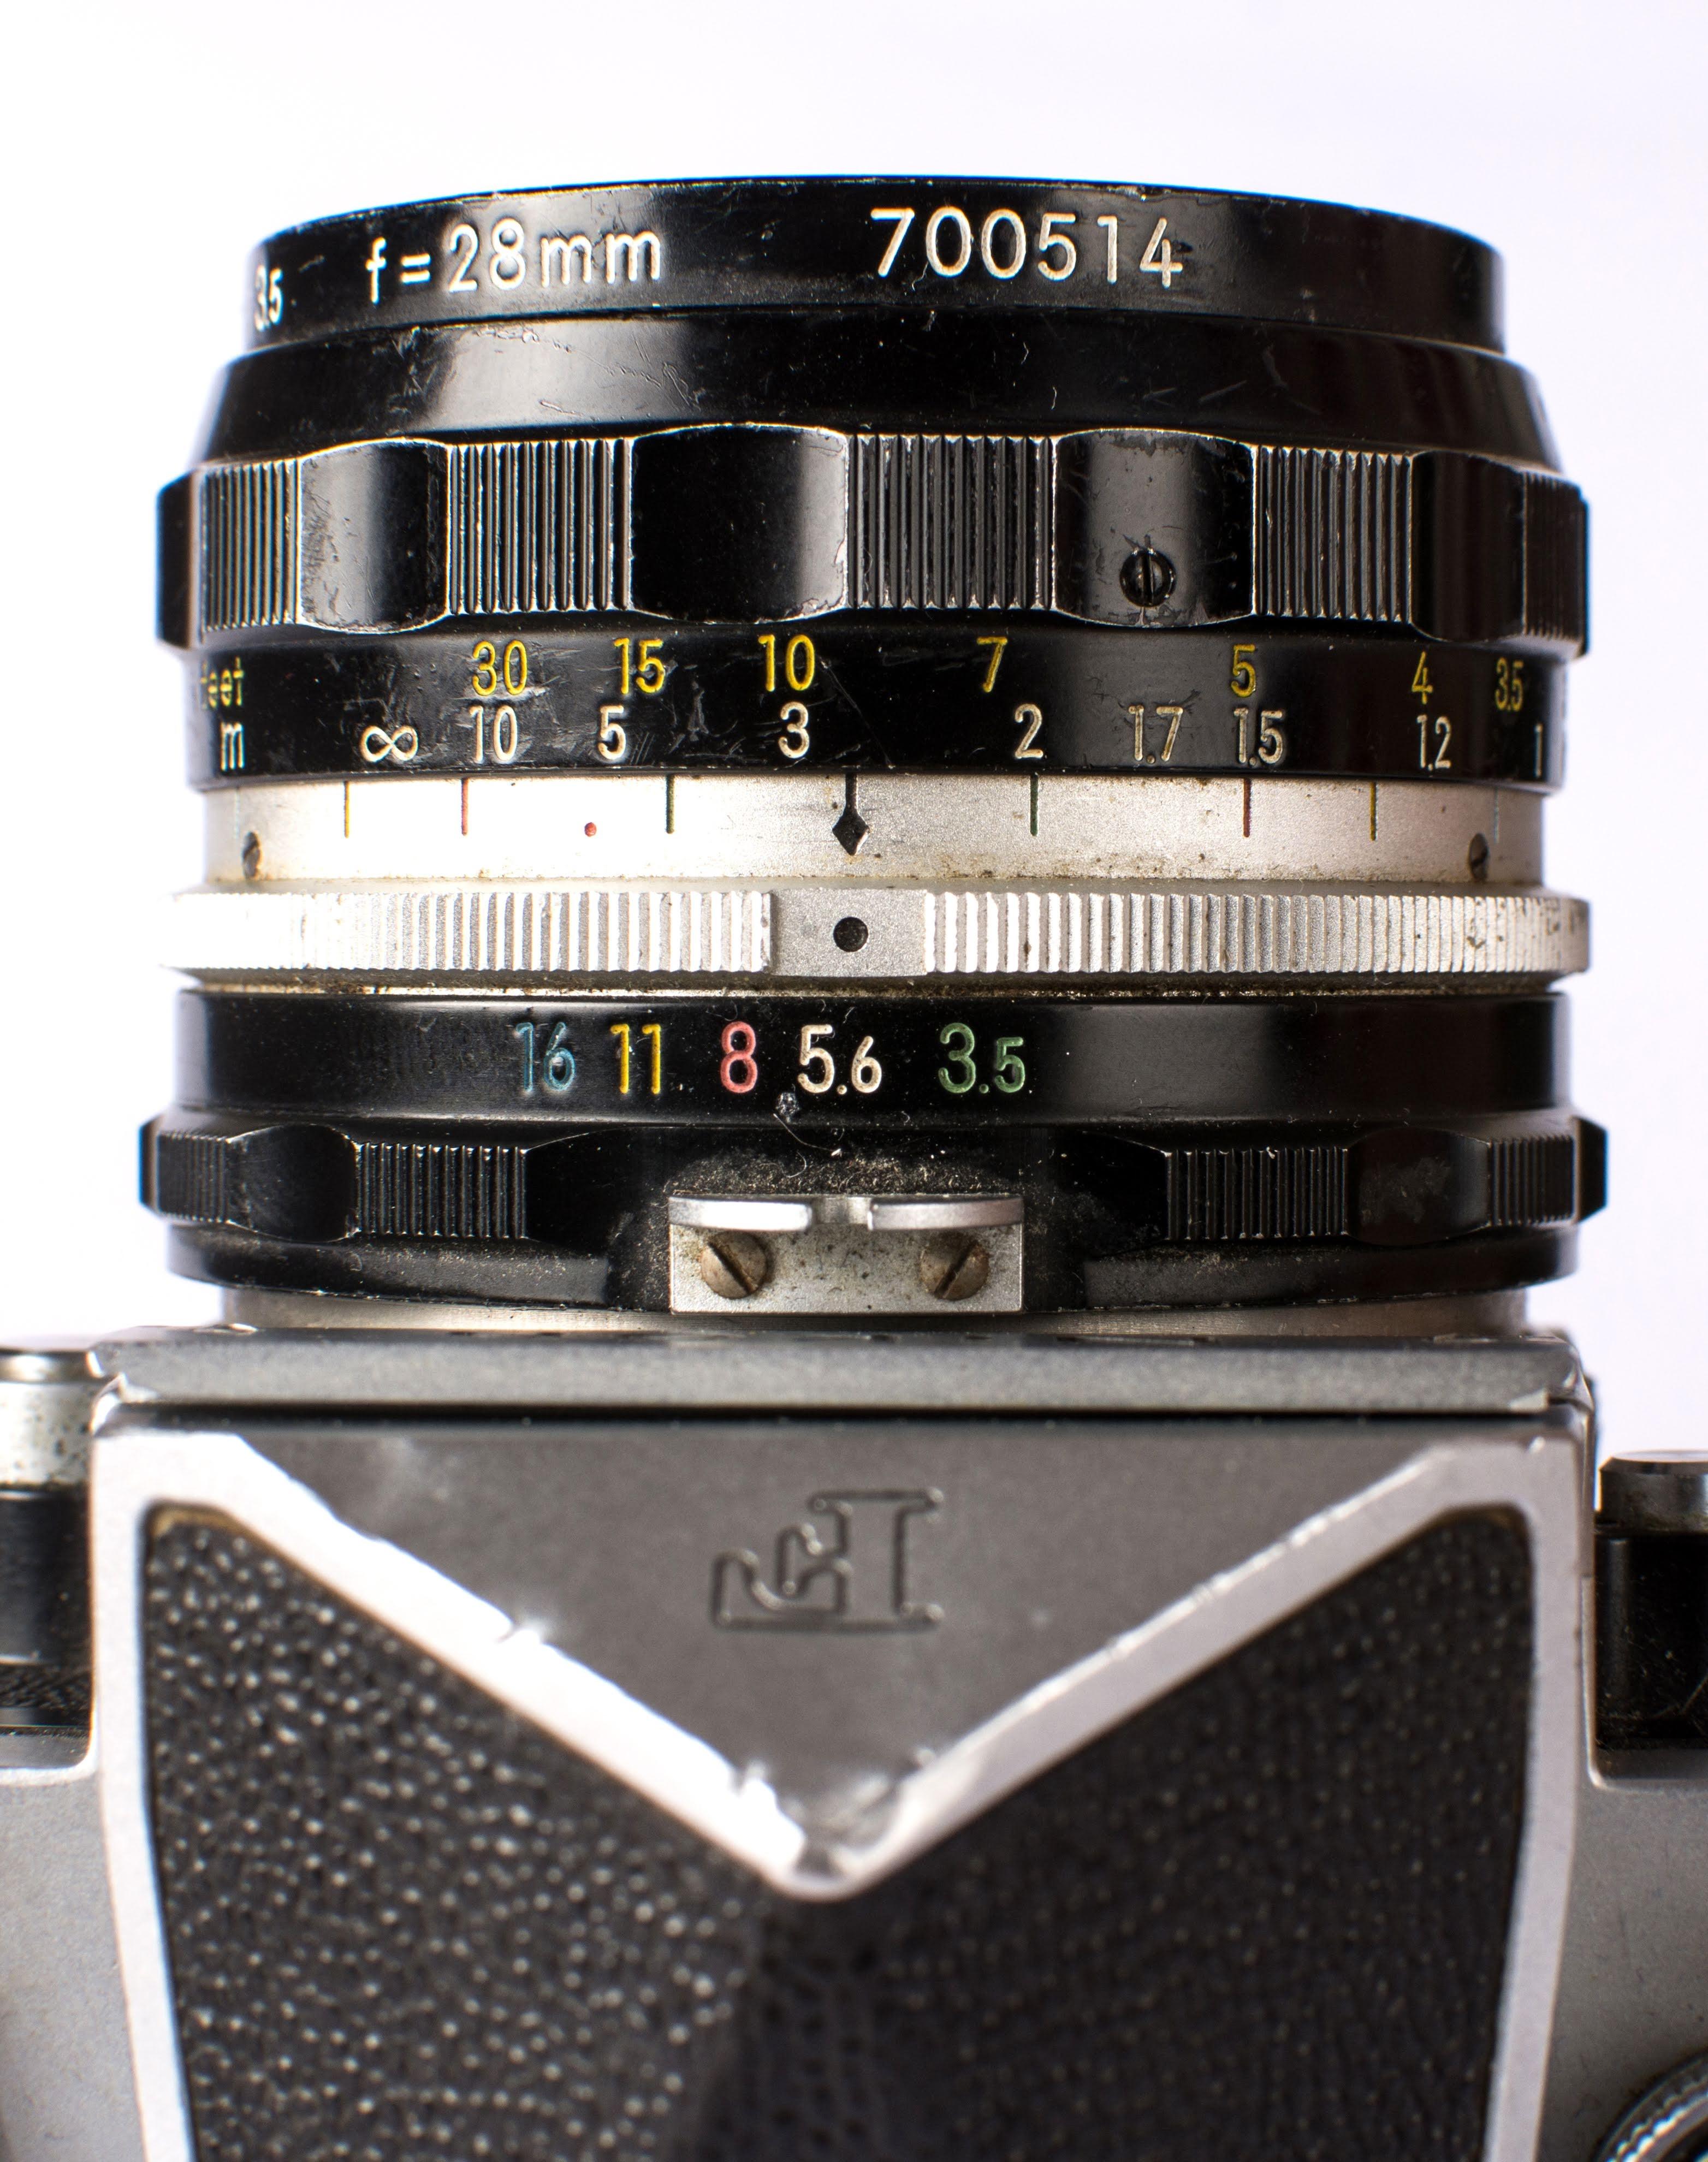 Nikon F 28mm Prime Lens